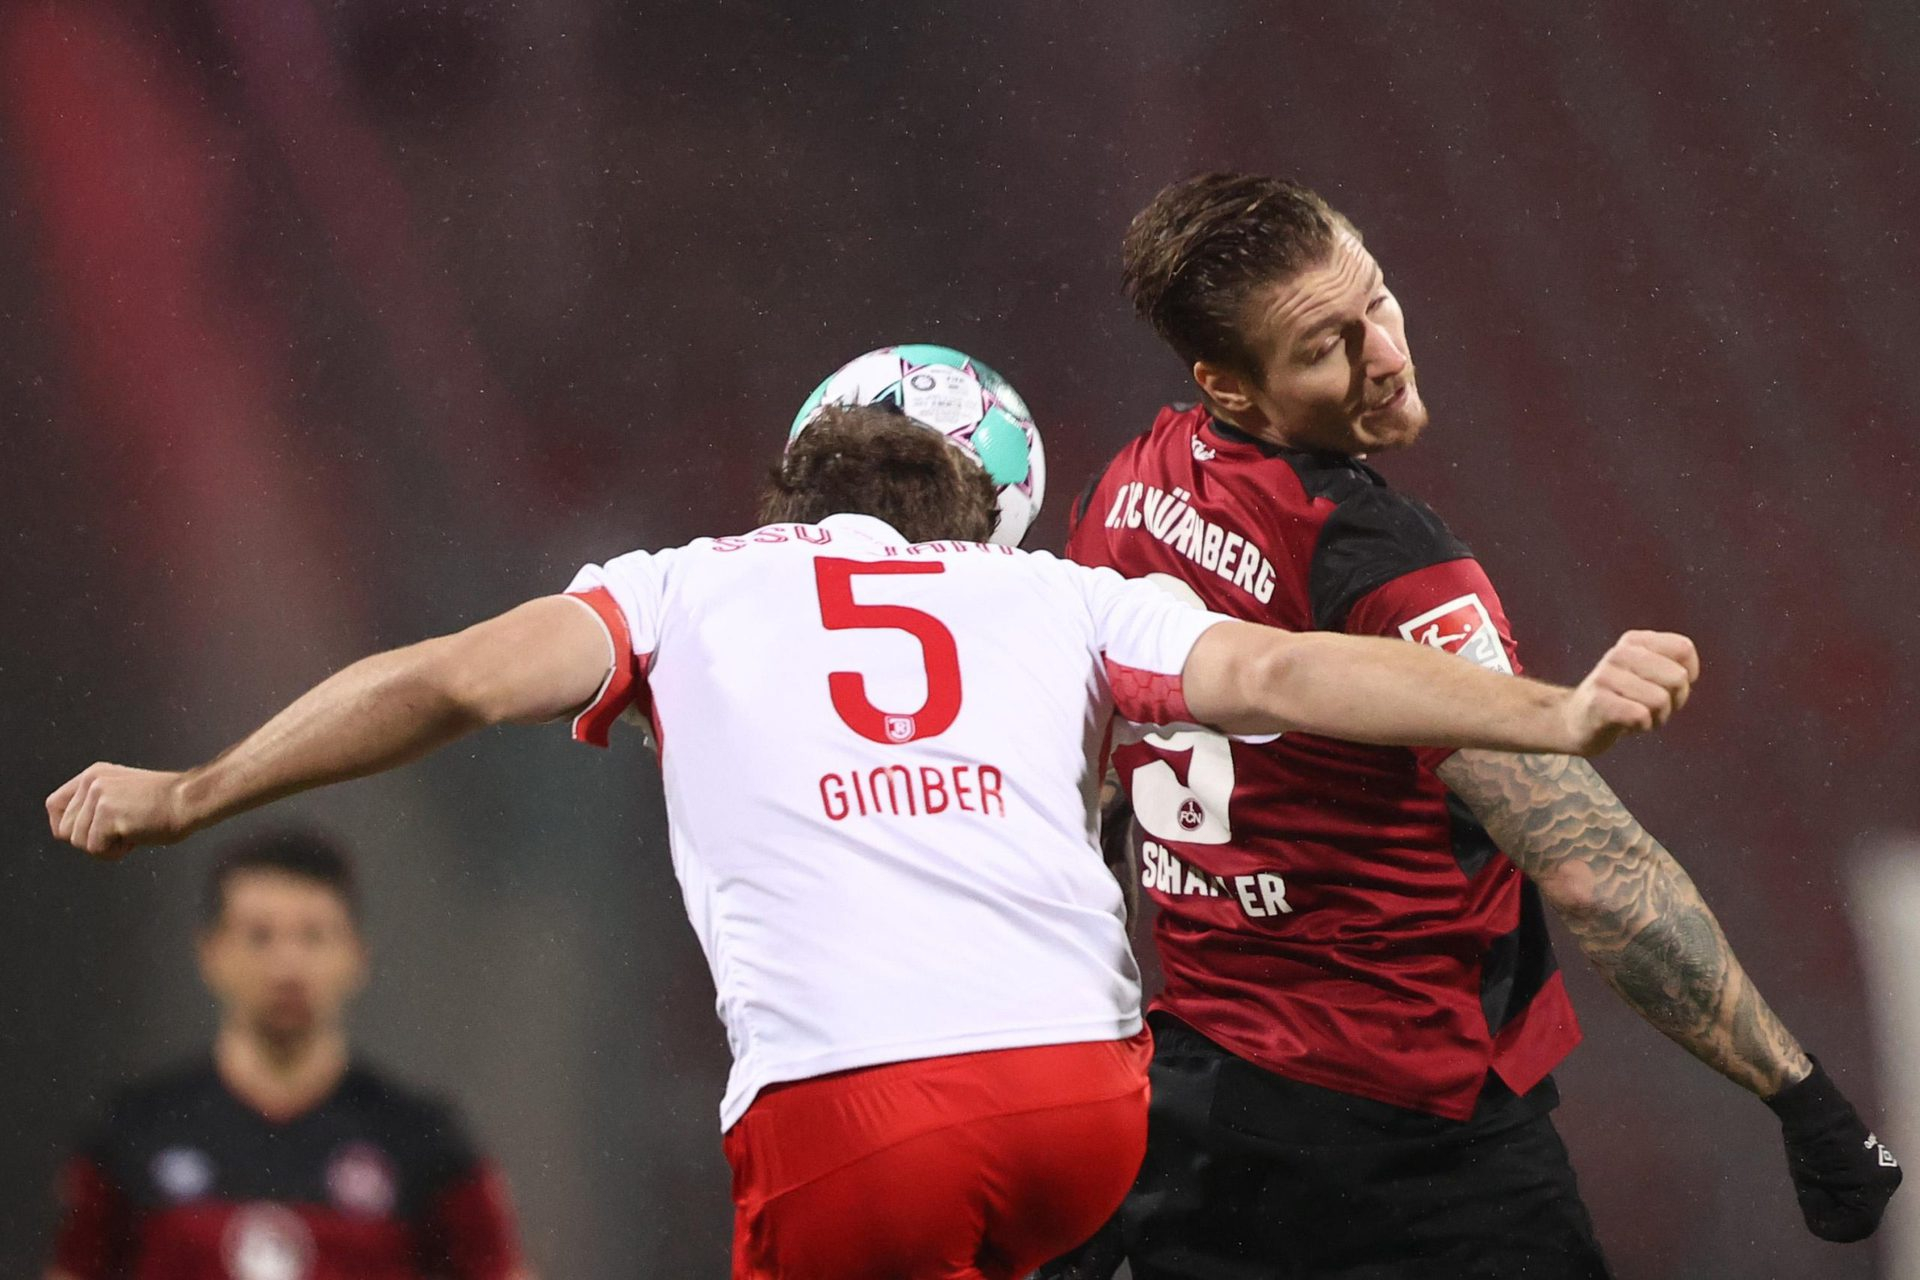 Albers schockt 1. FC Nürnberg: Jahn Regensburg gewinnt 1:0 2. Liga